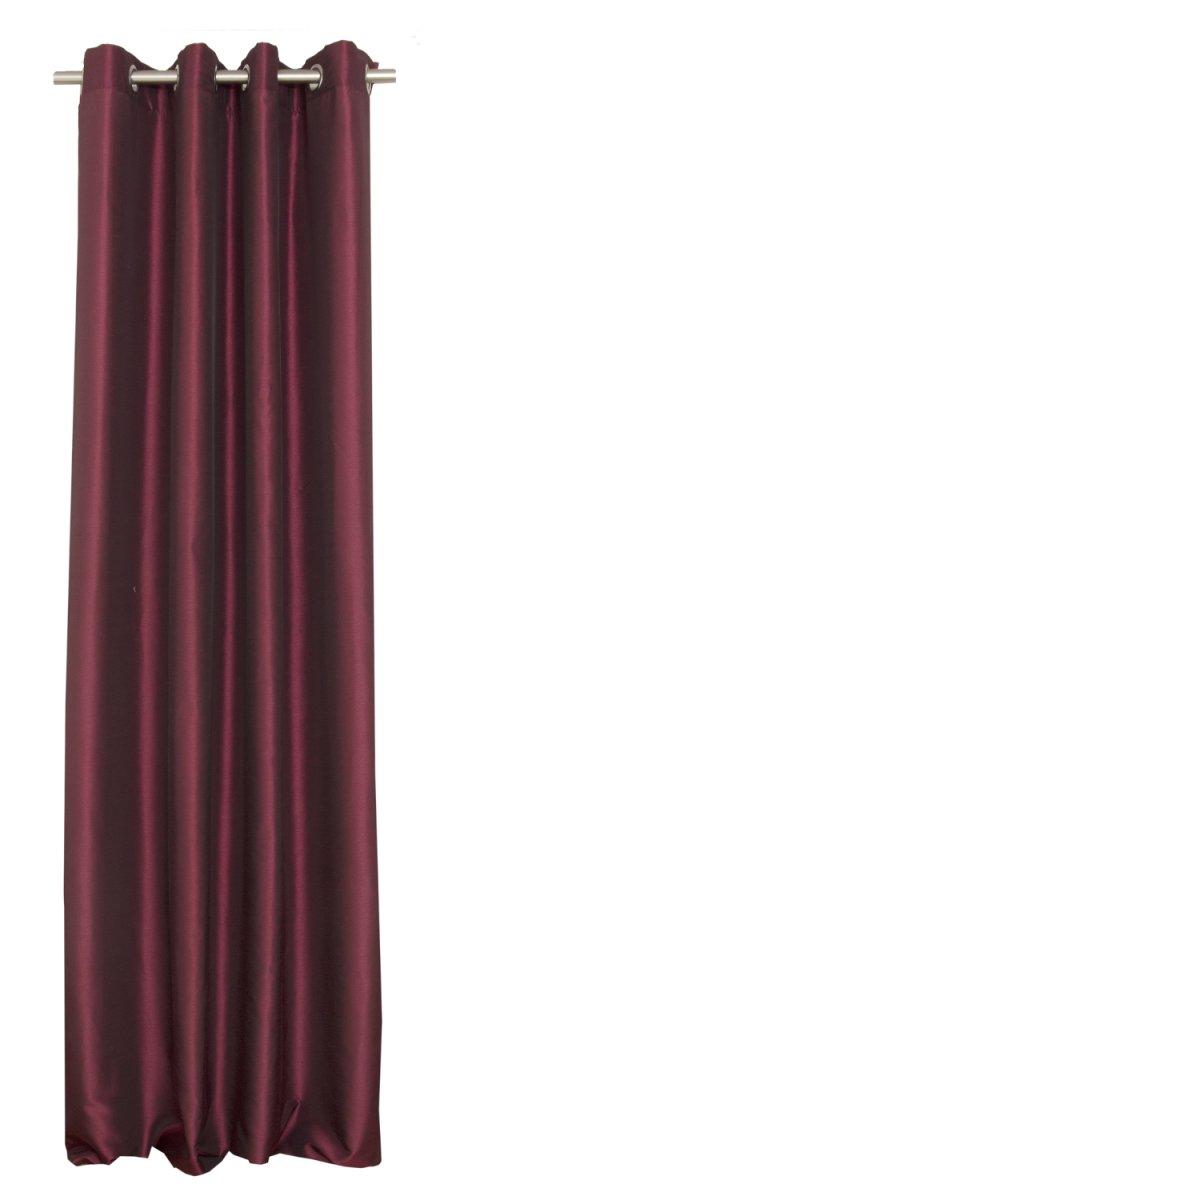 Curtain 2 Pcs Taffeta Wine